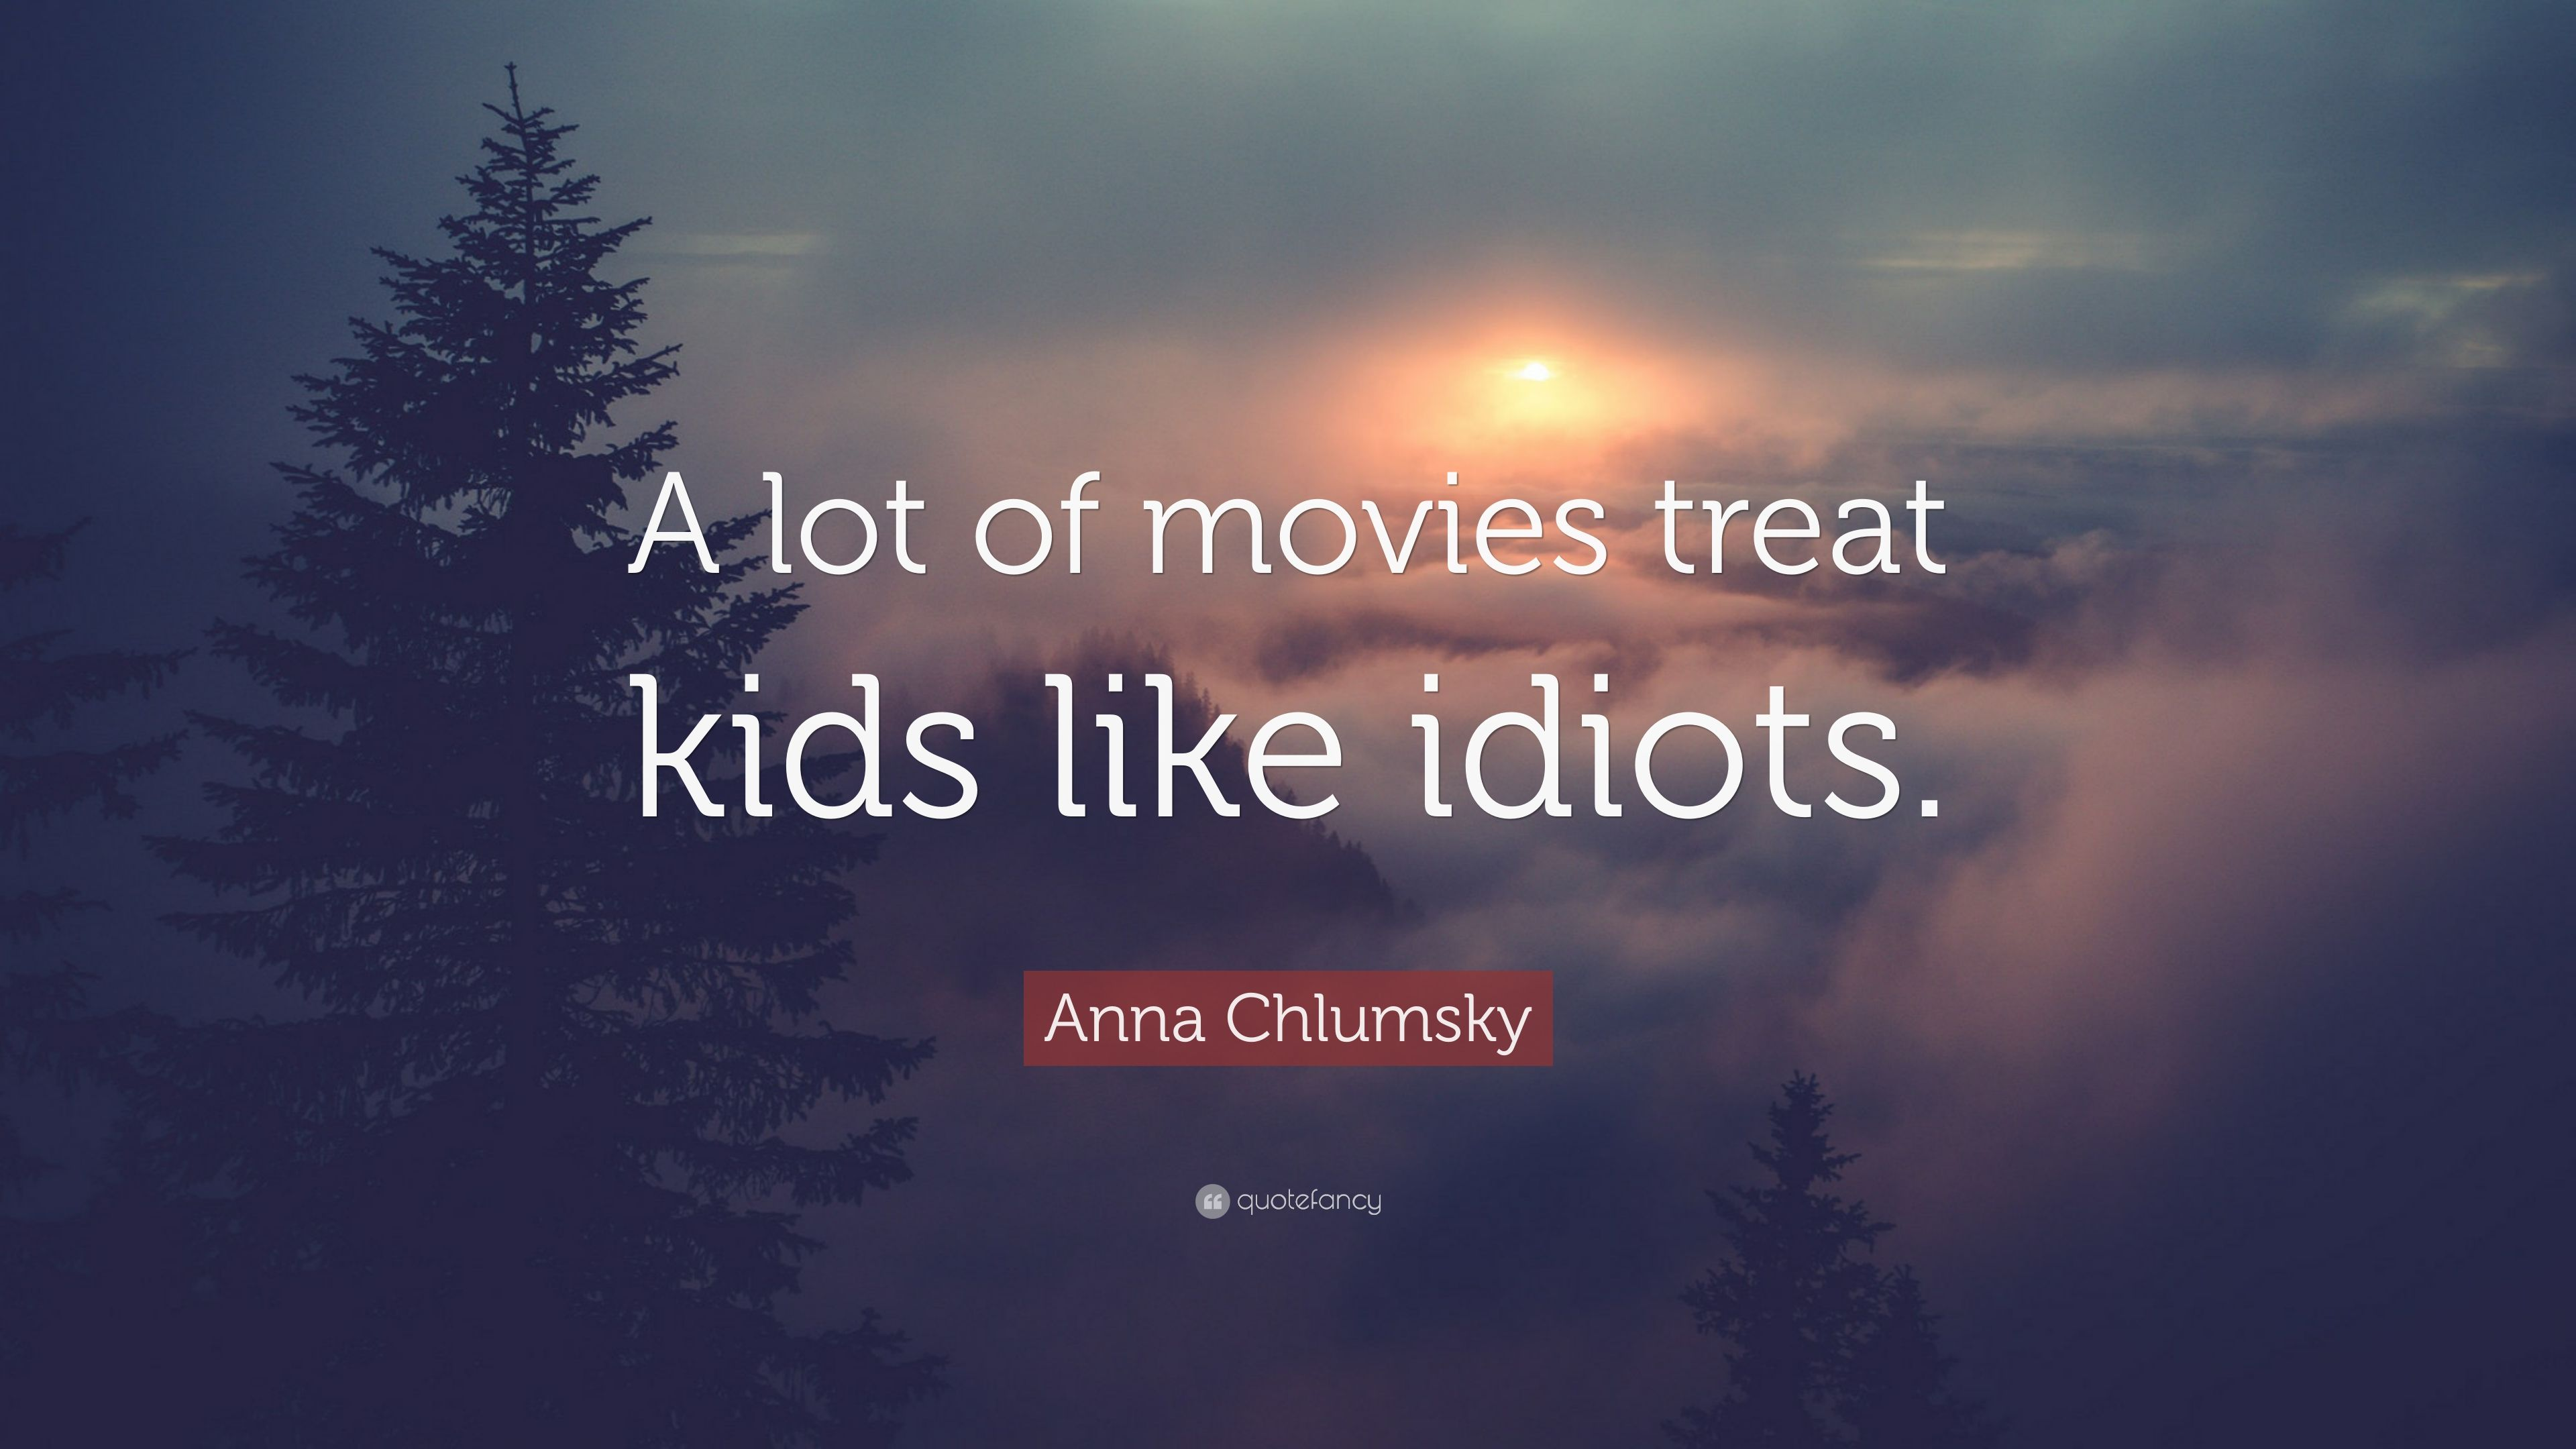 Anna Chlumsky Quote \u201cA lot of movies treat kids like idiots